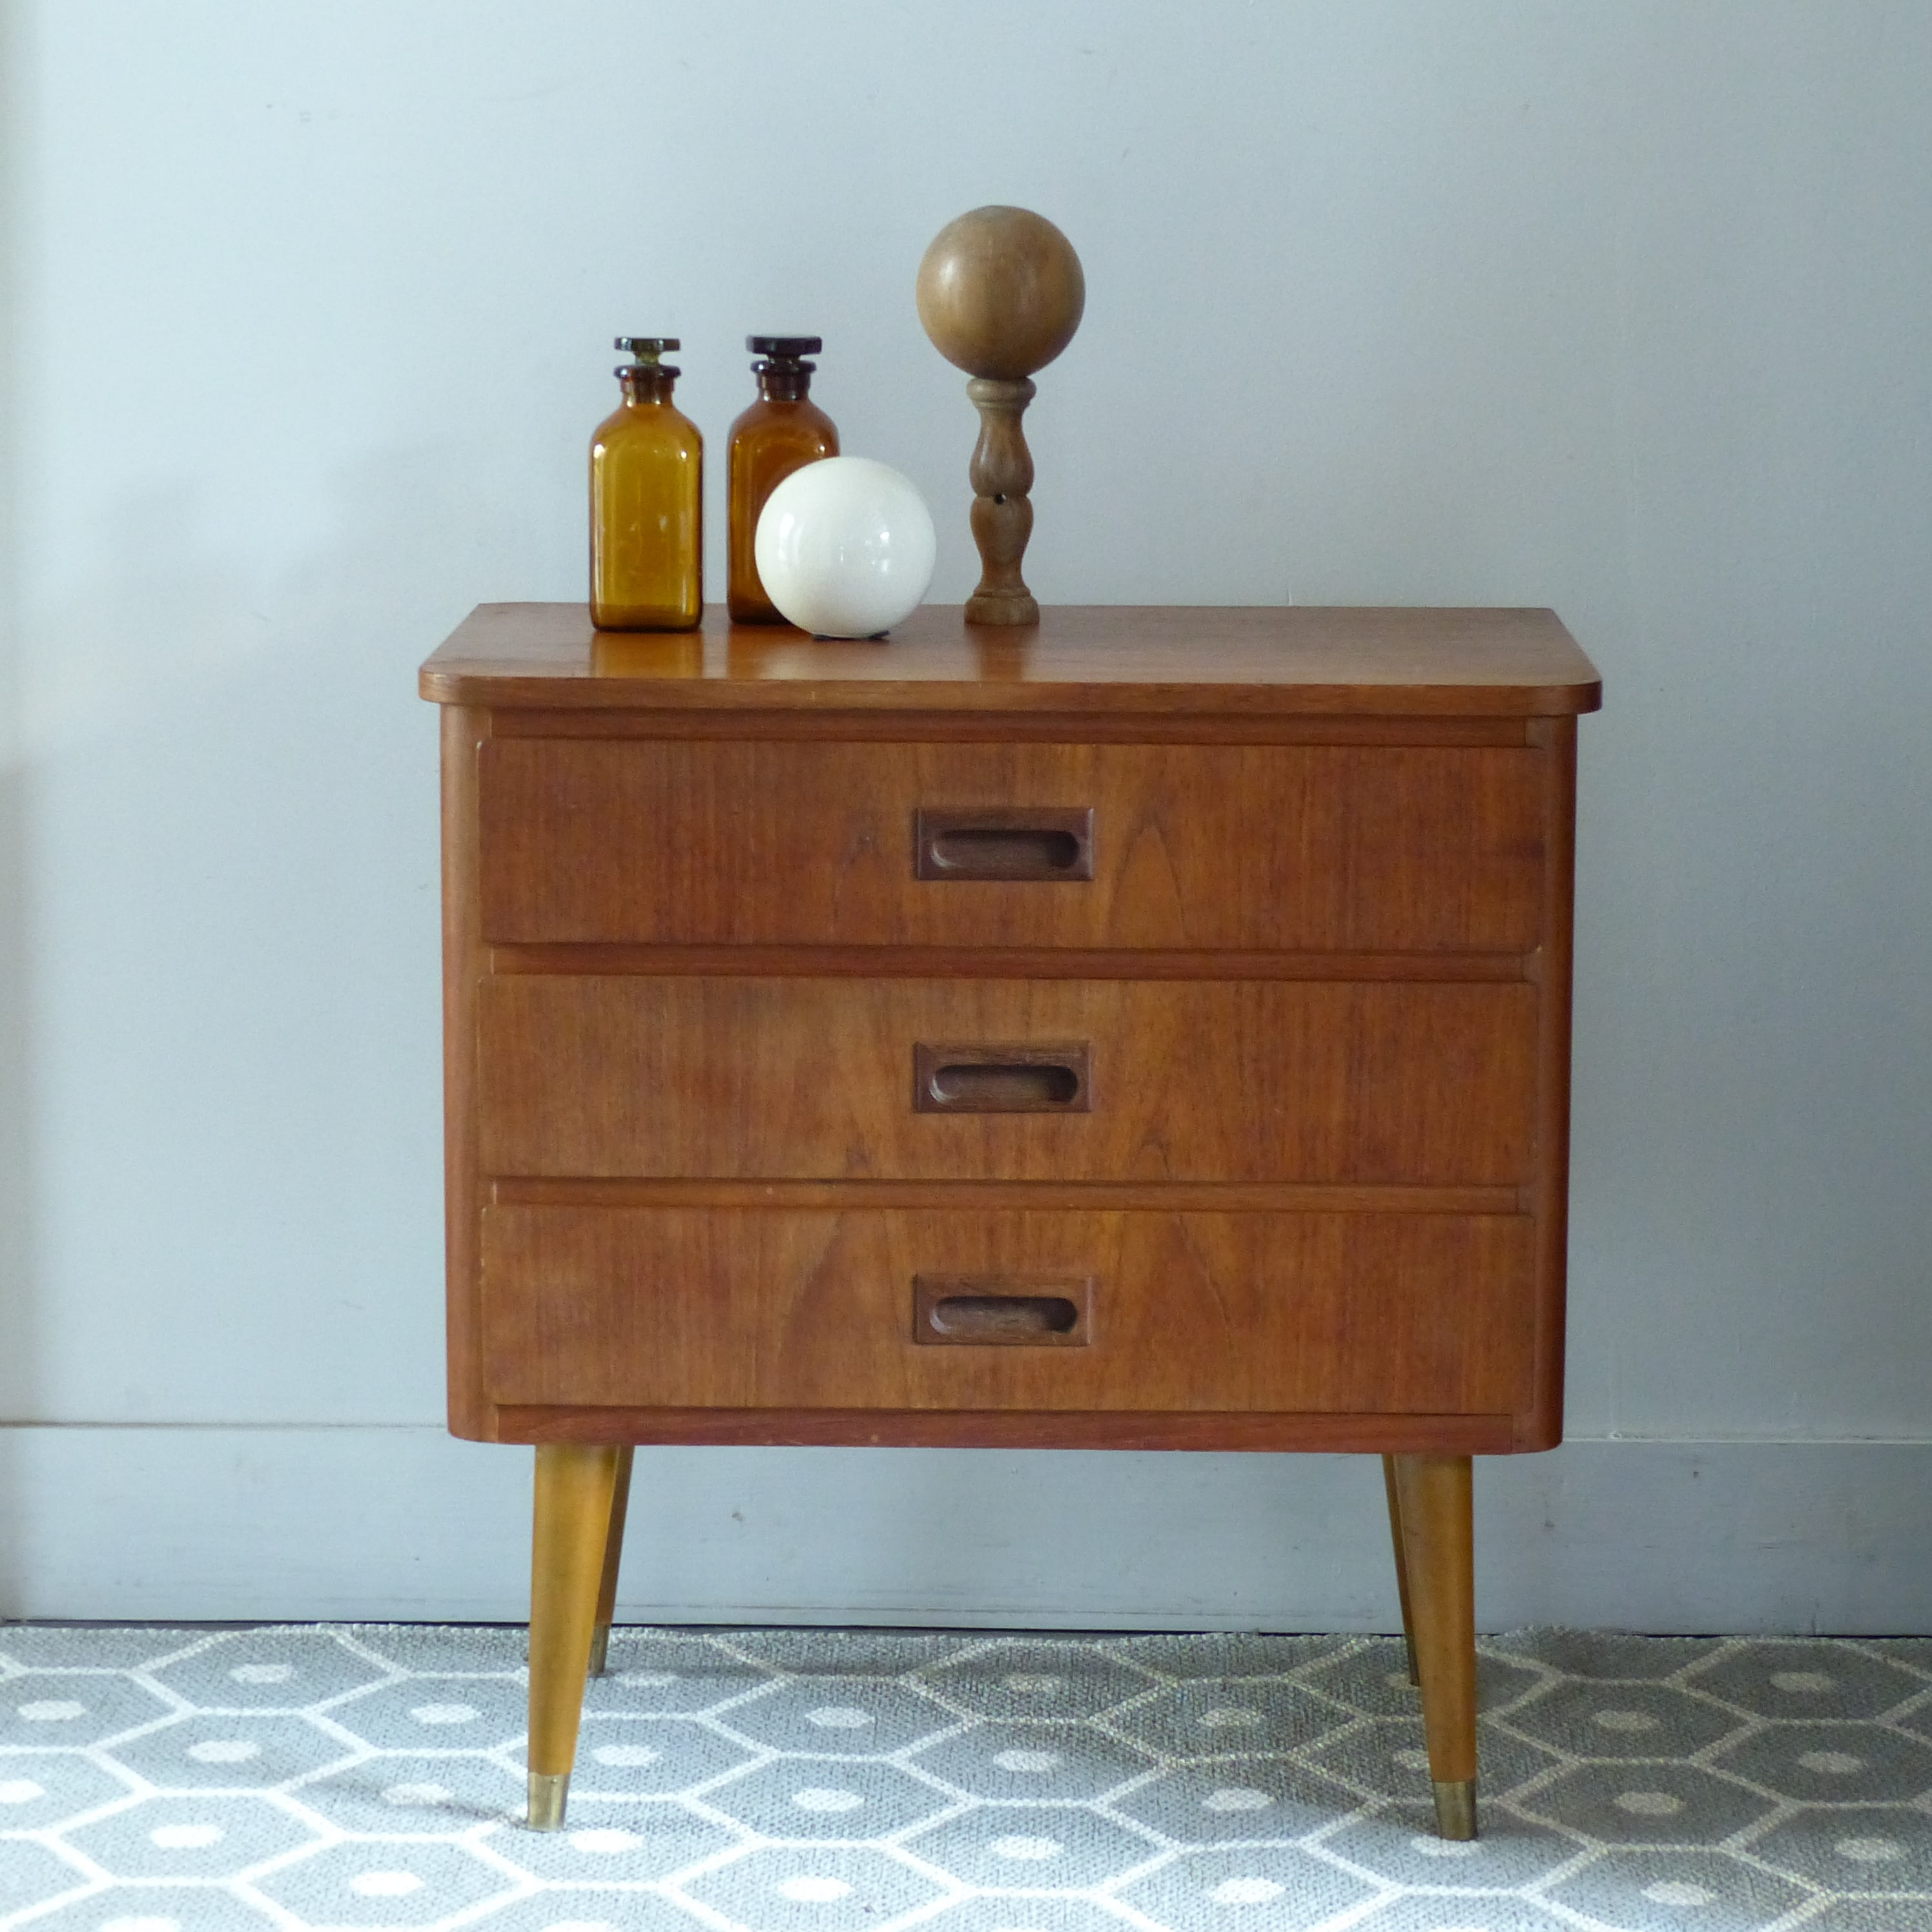 petite commode vintage lignedebrocante brocante en ligne chine pour vous meubles vintage et. Black Bedroom Furniture Sets. Home Design Ideas